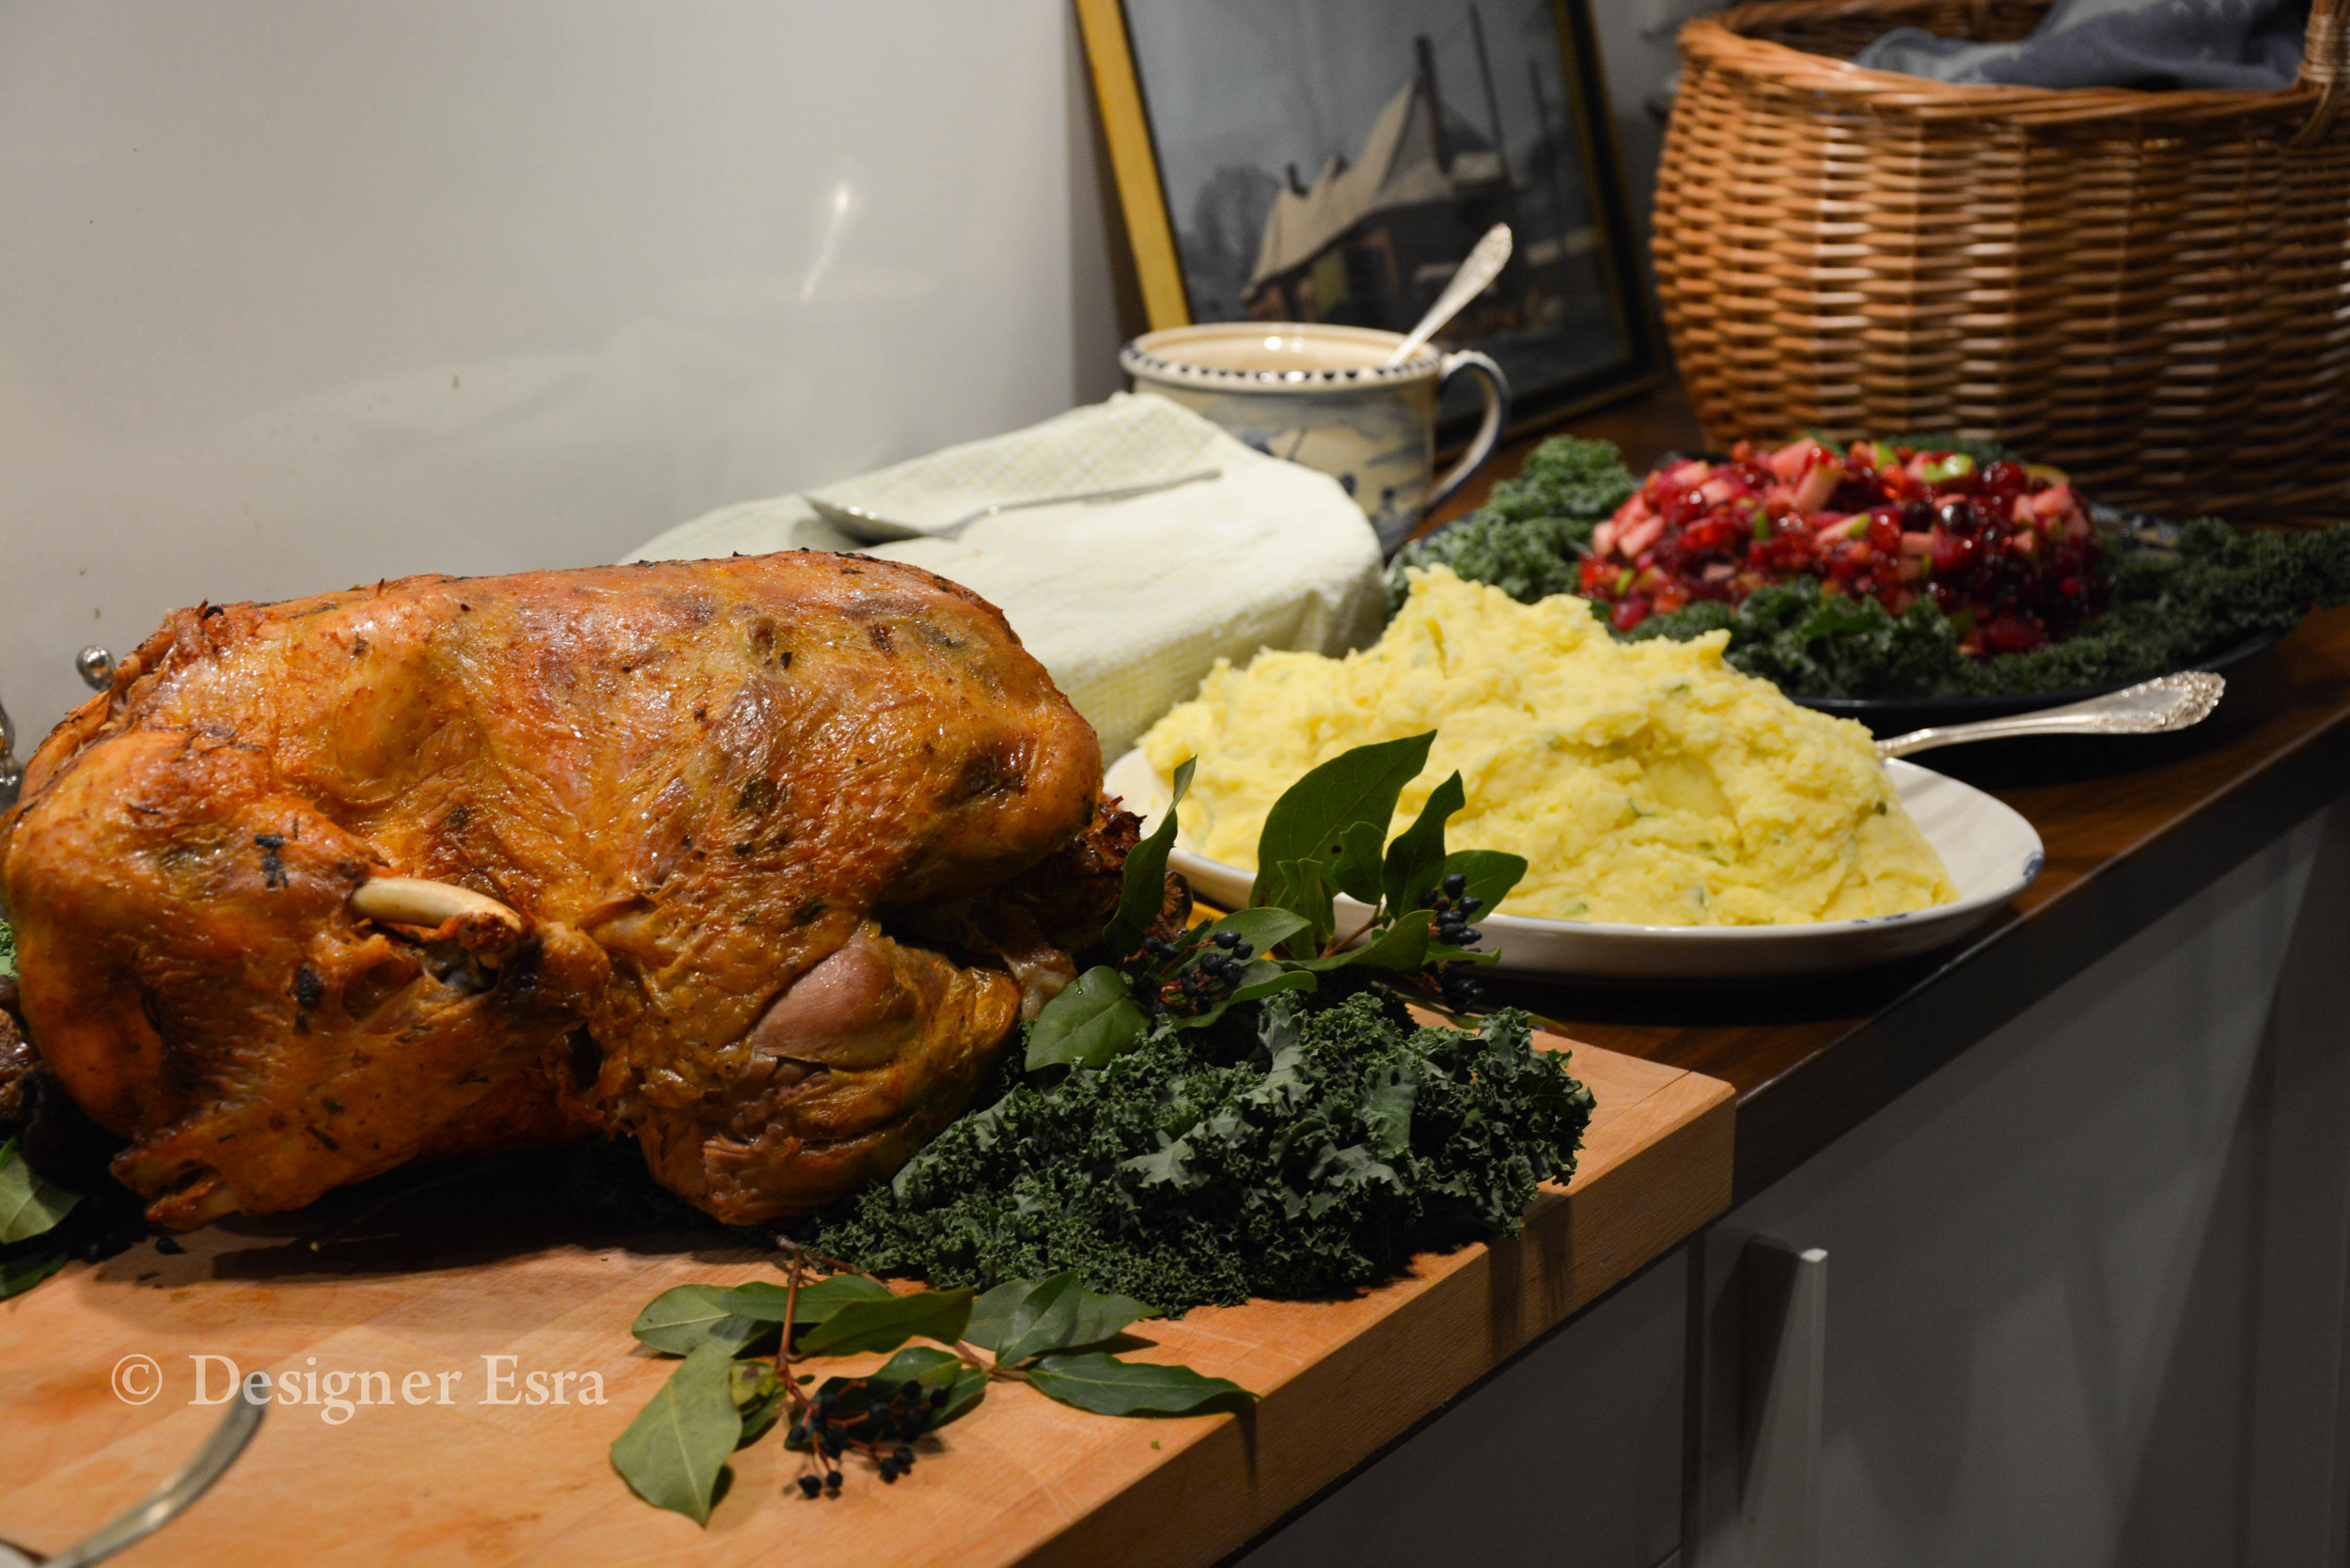 The Grand Turkey